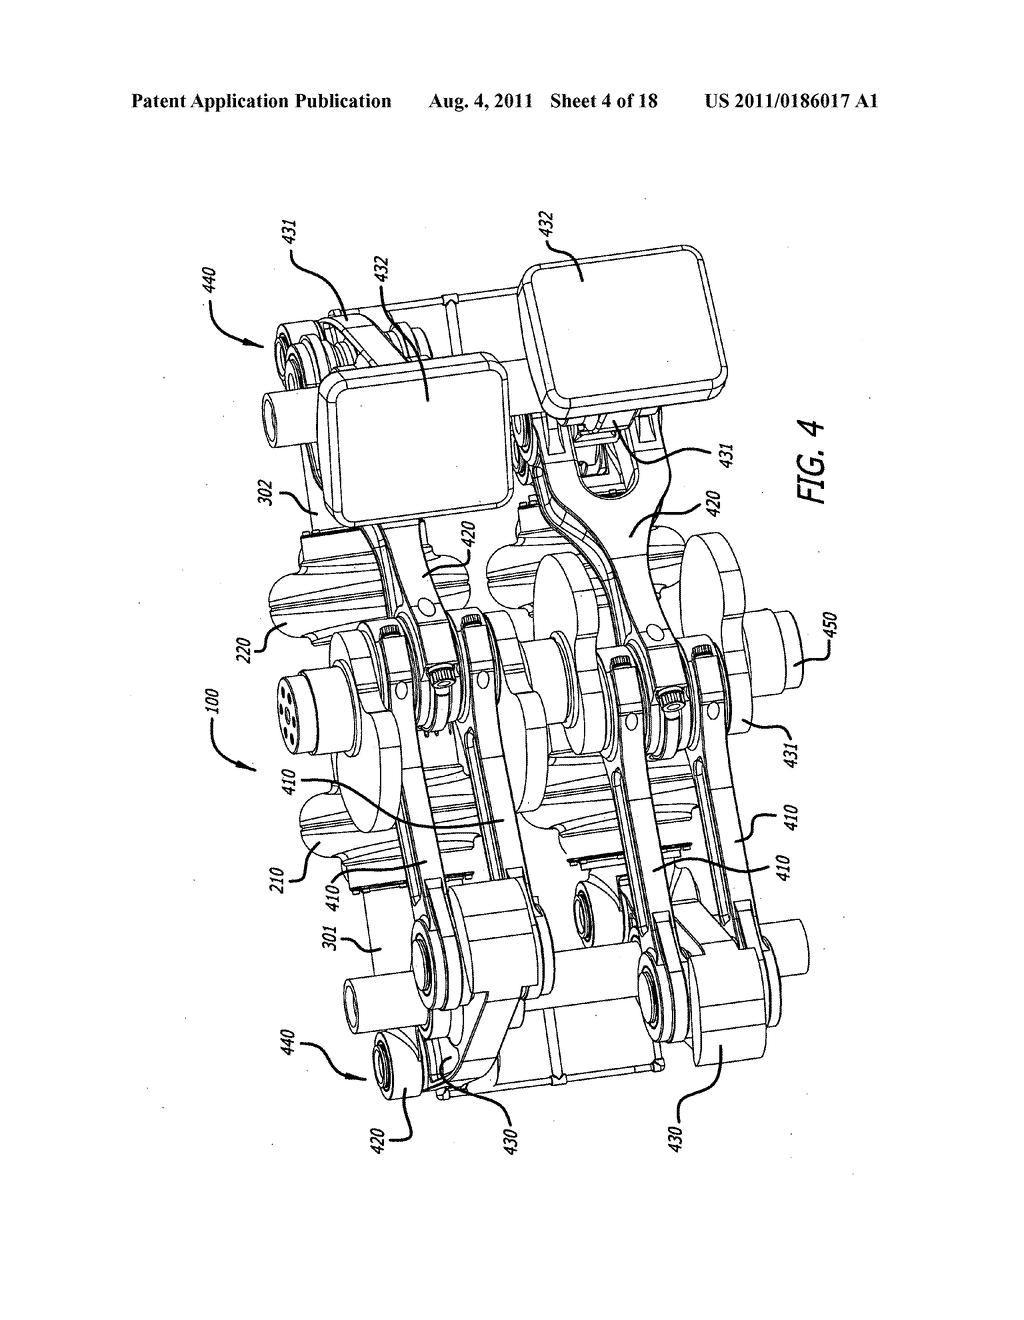 Horizontally Opposed Engine Diagram. Images. Auto Fuse Box